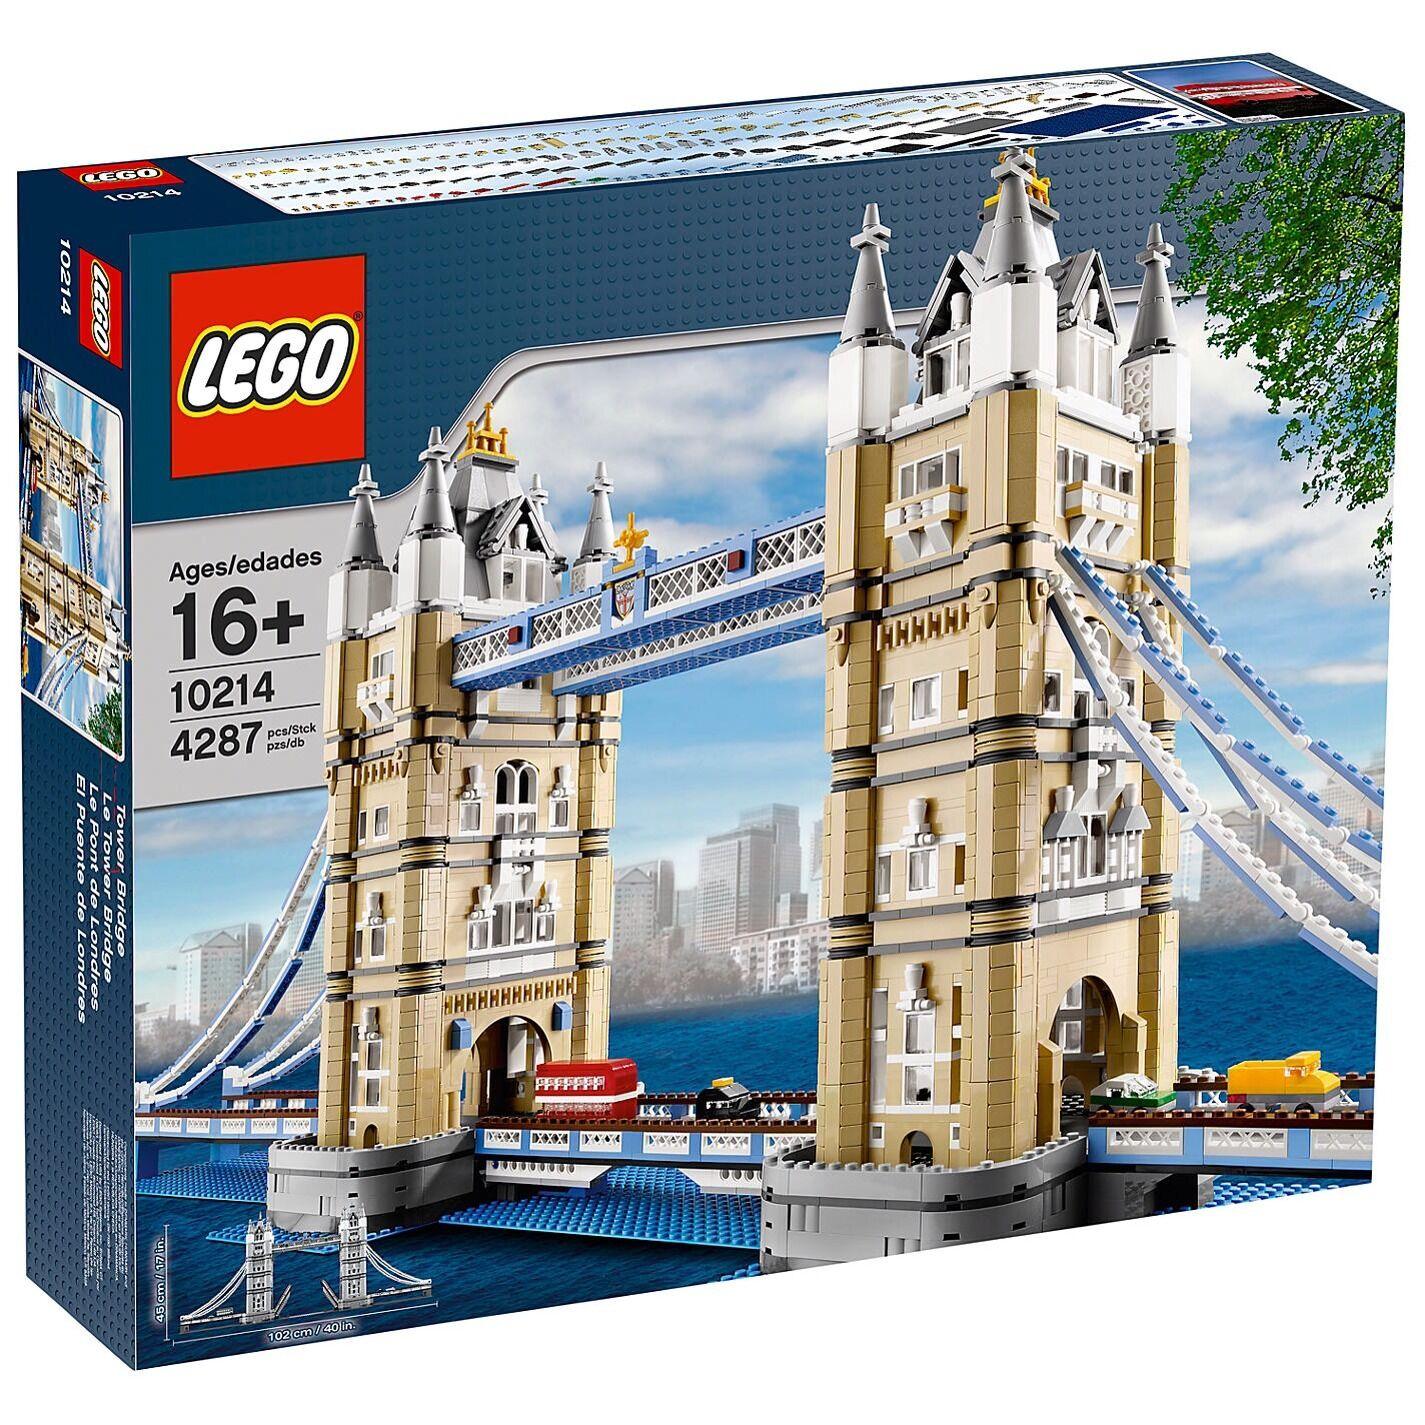 LEGO CREATOR TOWER BRIDGE 10214 - - - (New sealed) LONDON SET 4287 Pieces Land Mark 28df7a